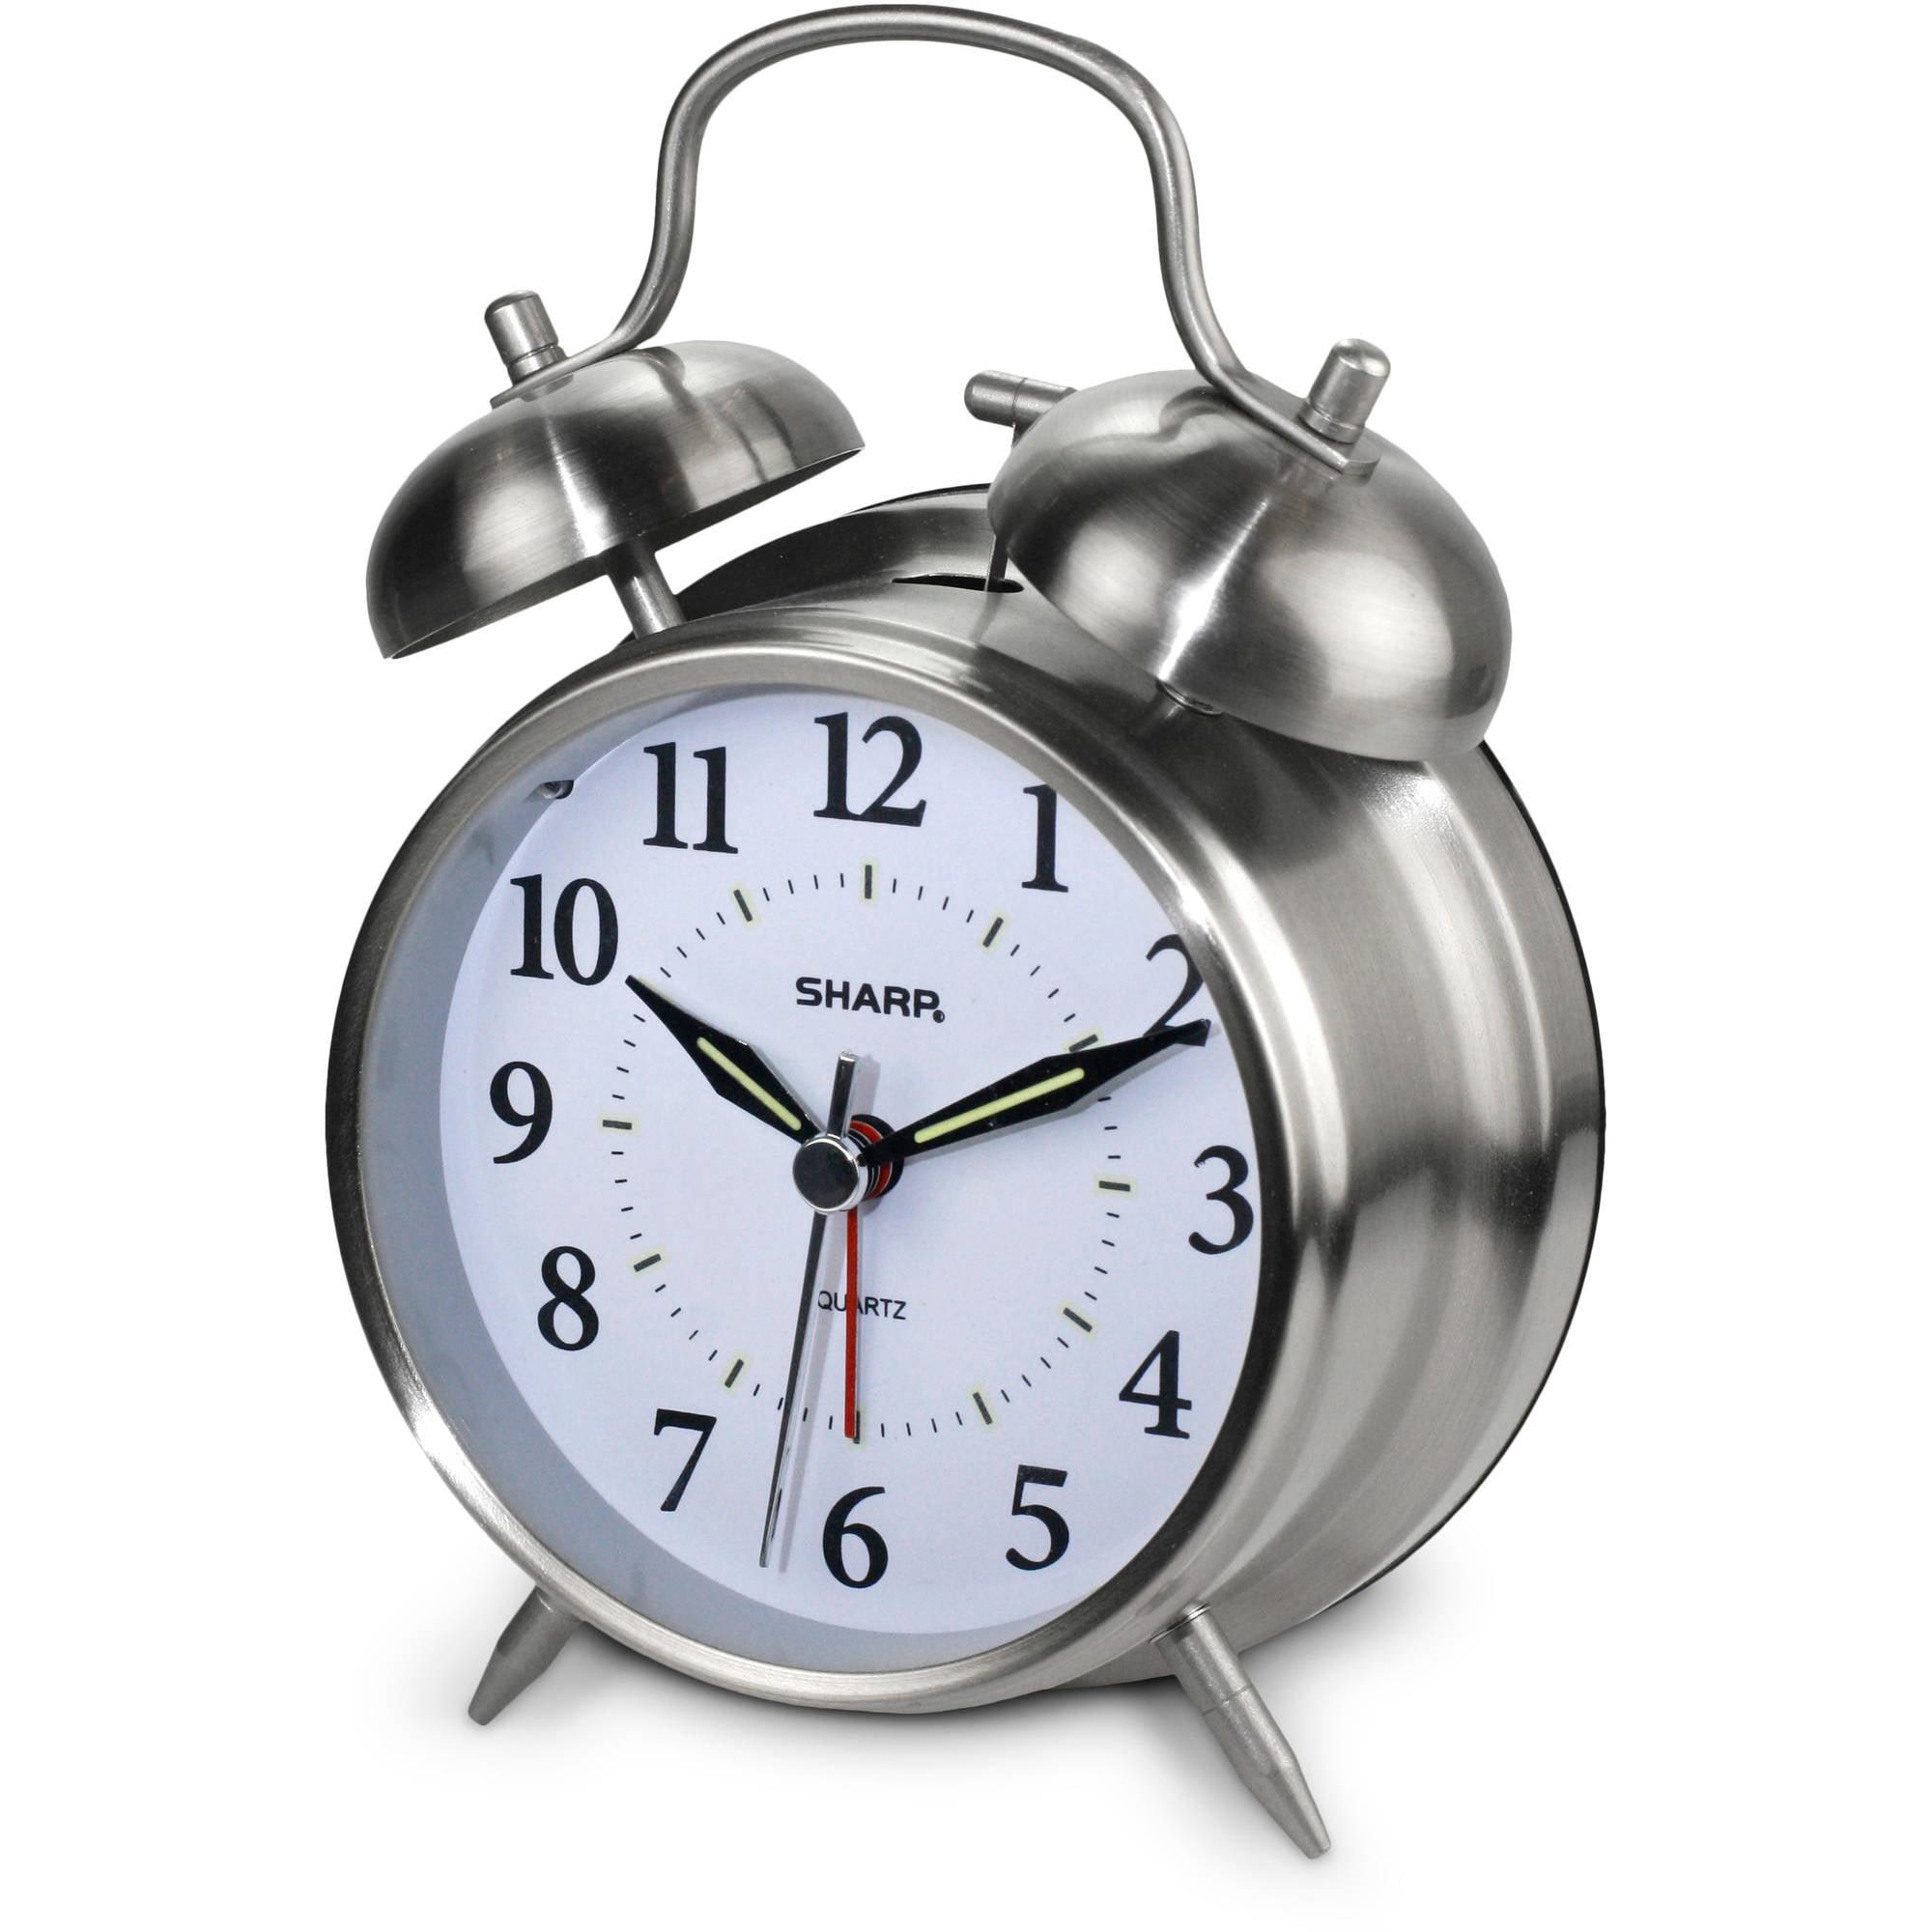 Sharp Twinbell Quartz Analog Alarm Clock